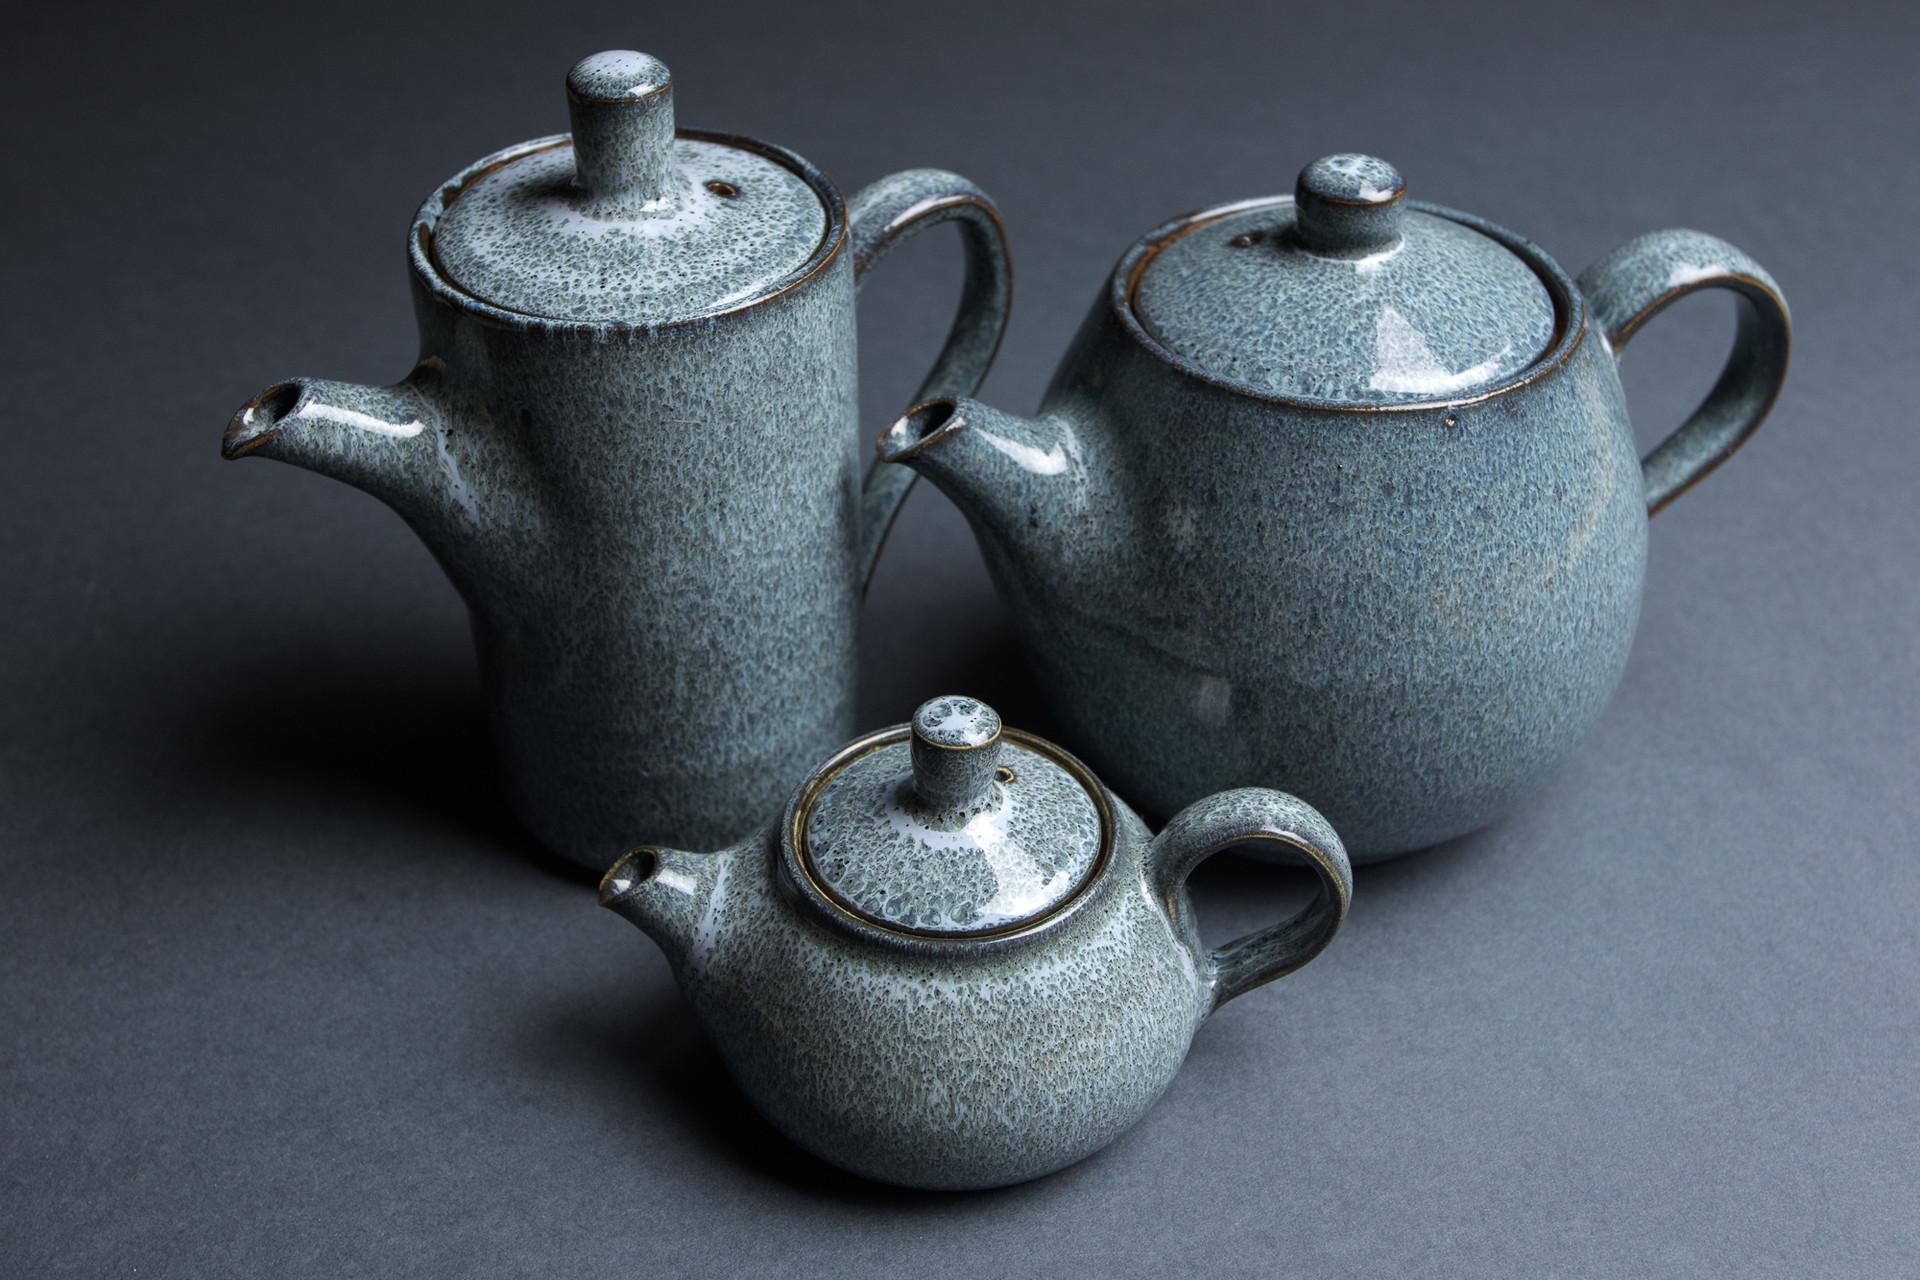 Stoneware teaware